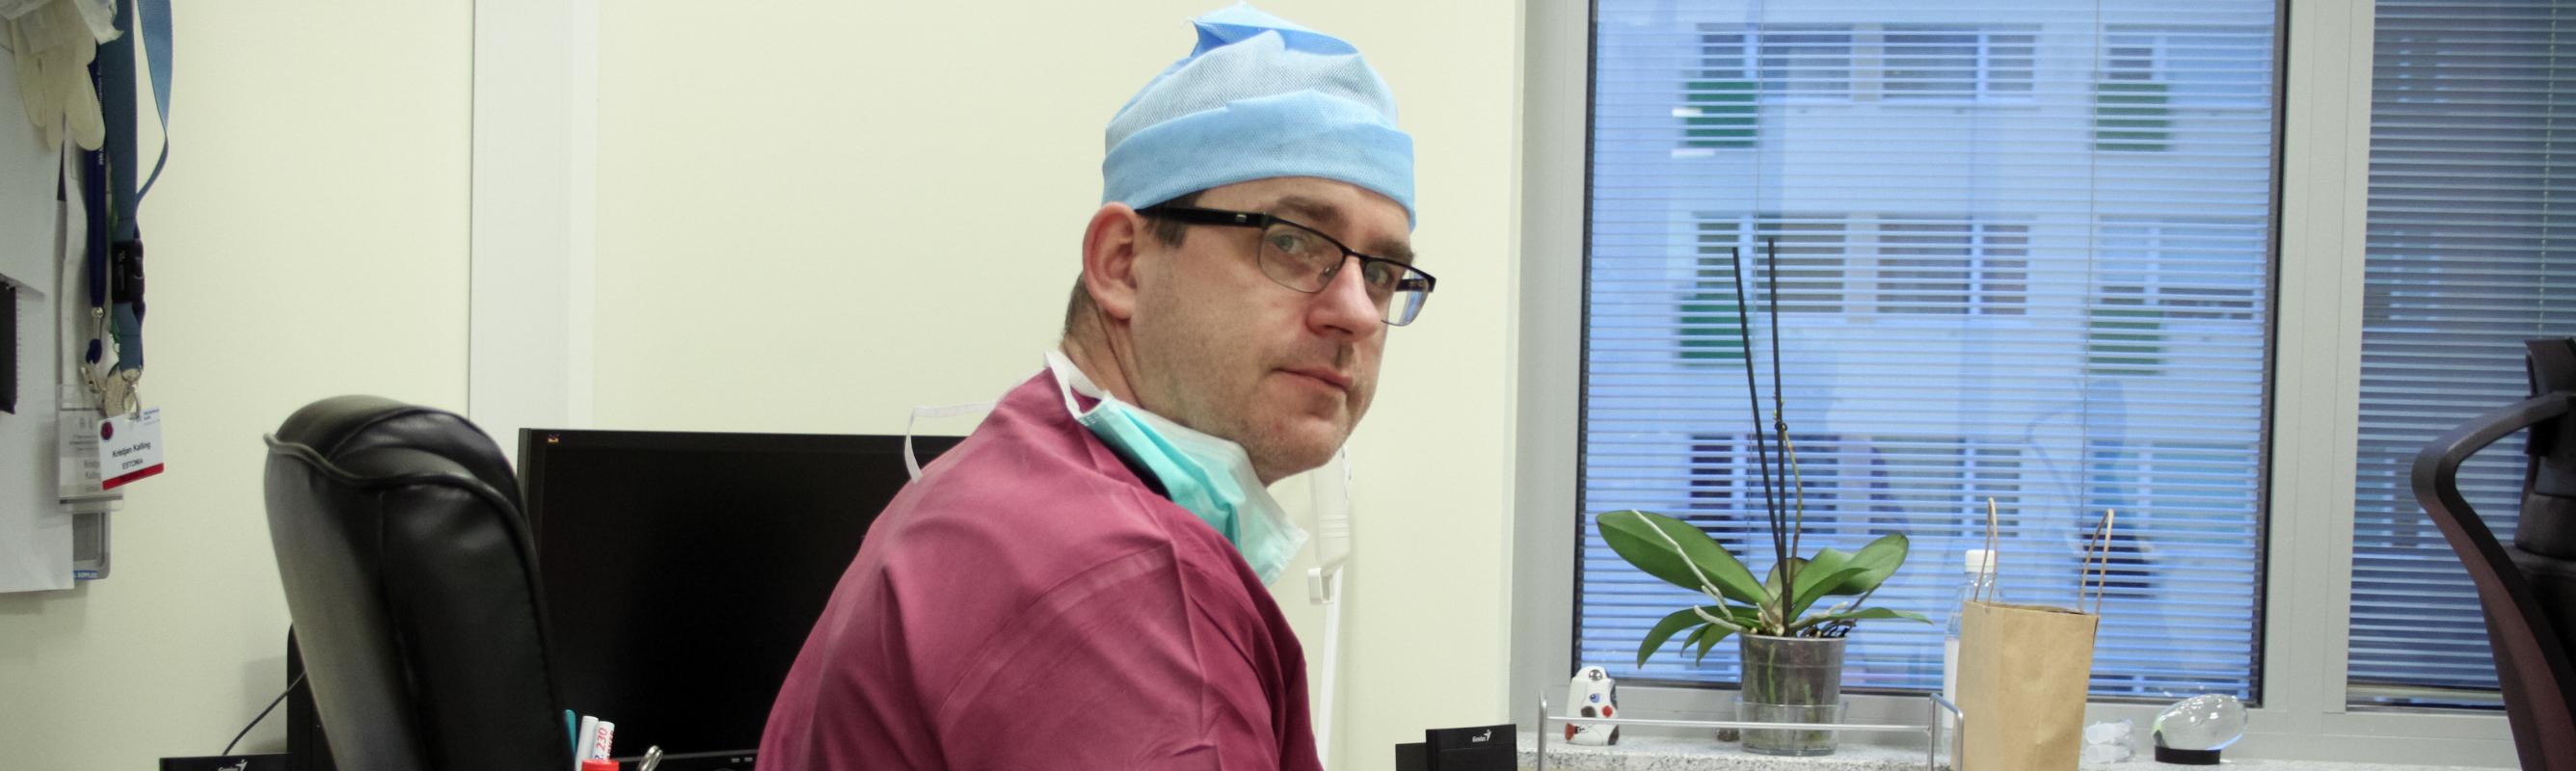 Keskuse juhataja dr Kristjan Kalling